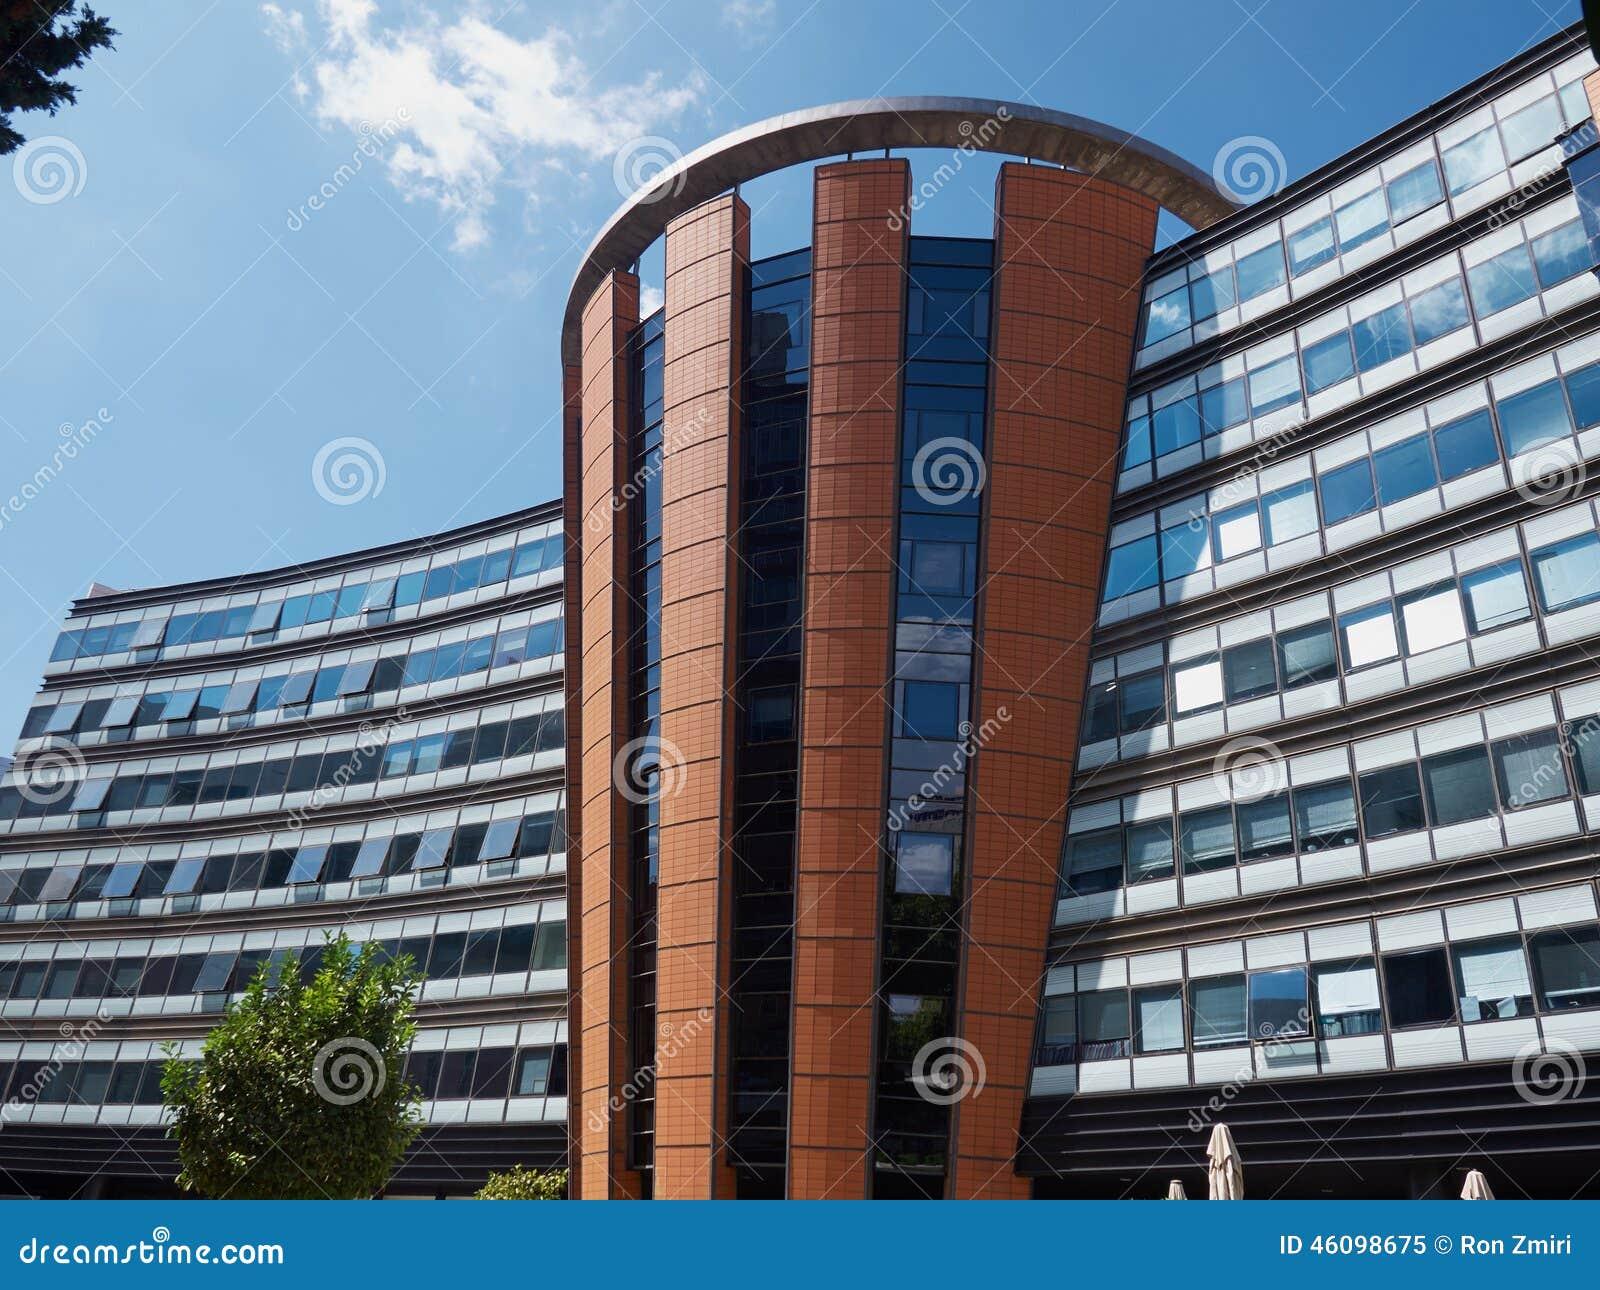 Corporate Business Building Corporate modern office